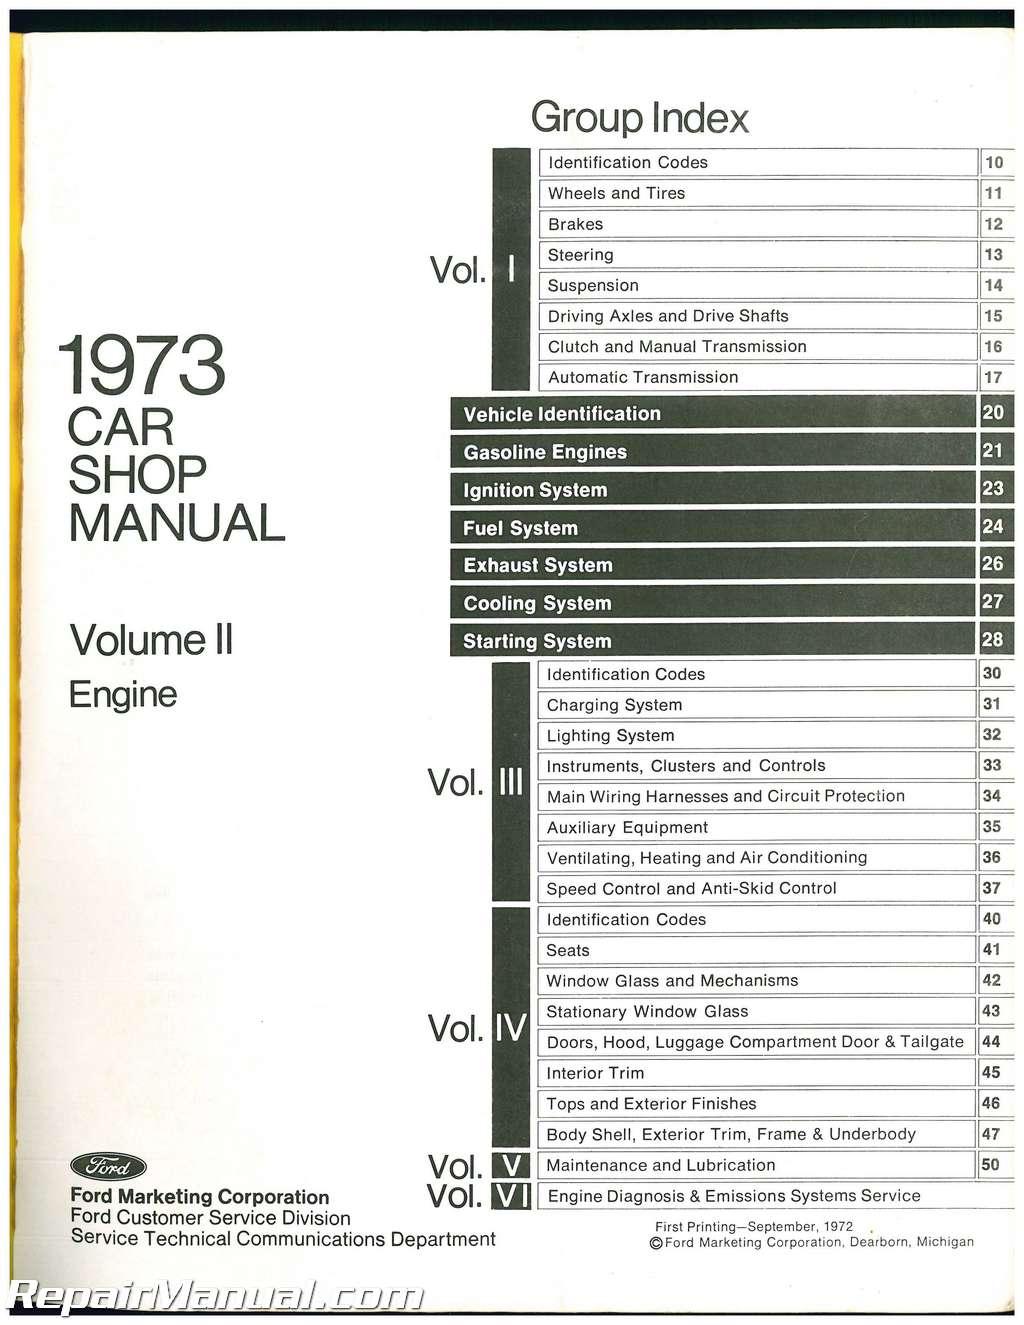 Used 1973 Ford Car Shop Manual Volume 2 Engine